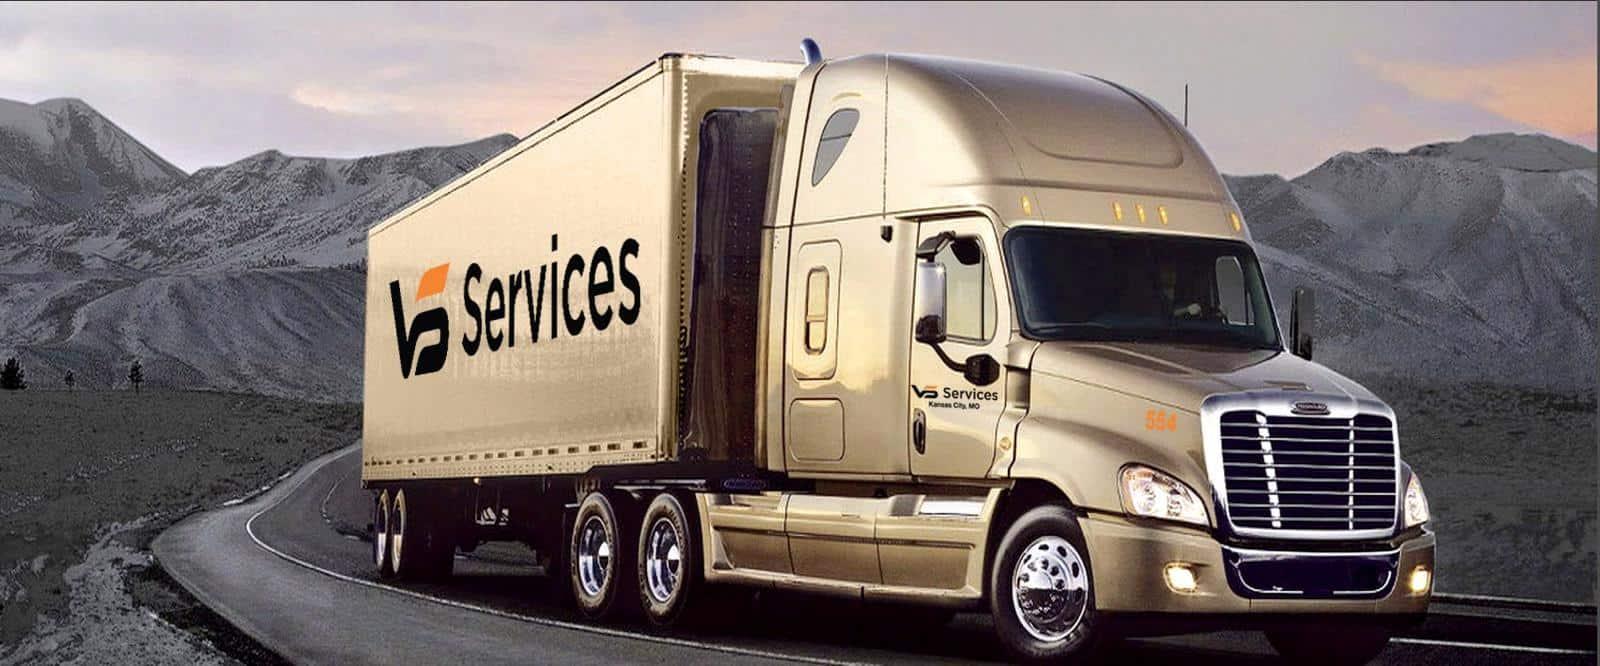 VS Services LLC